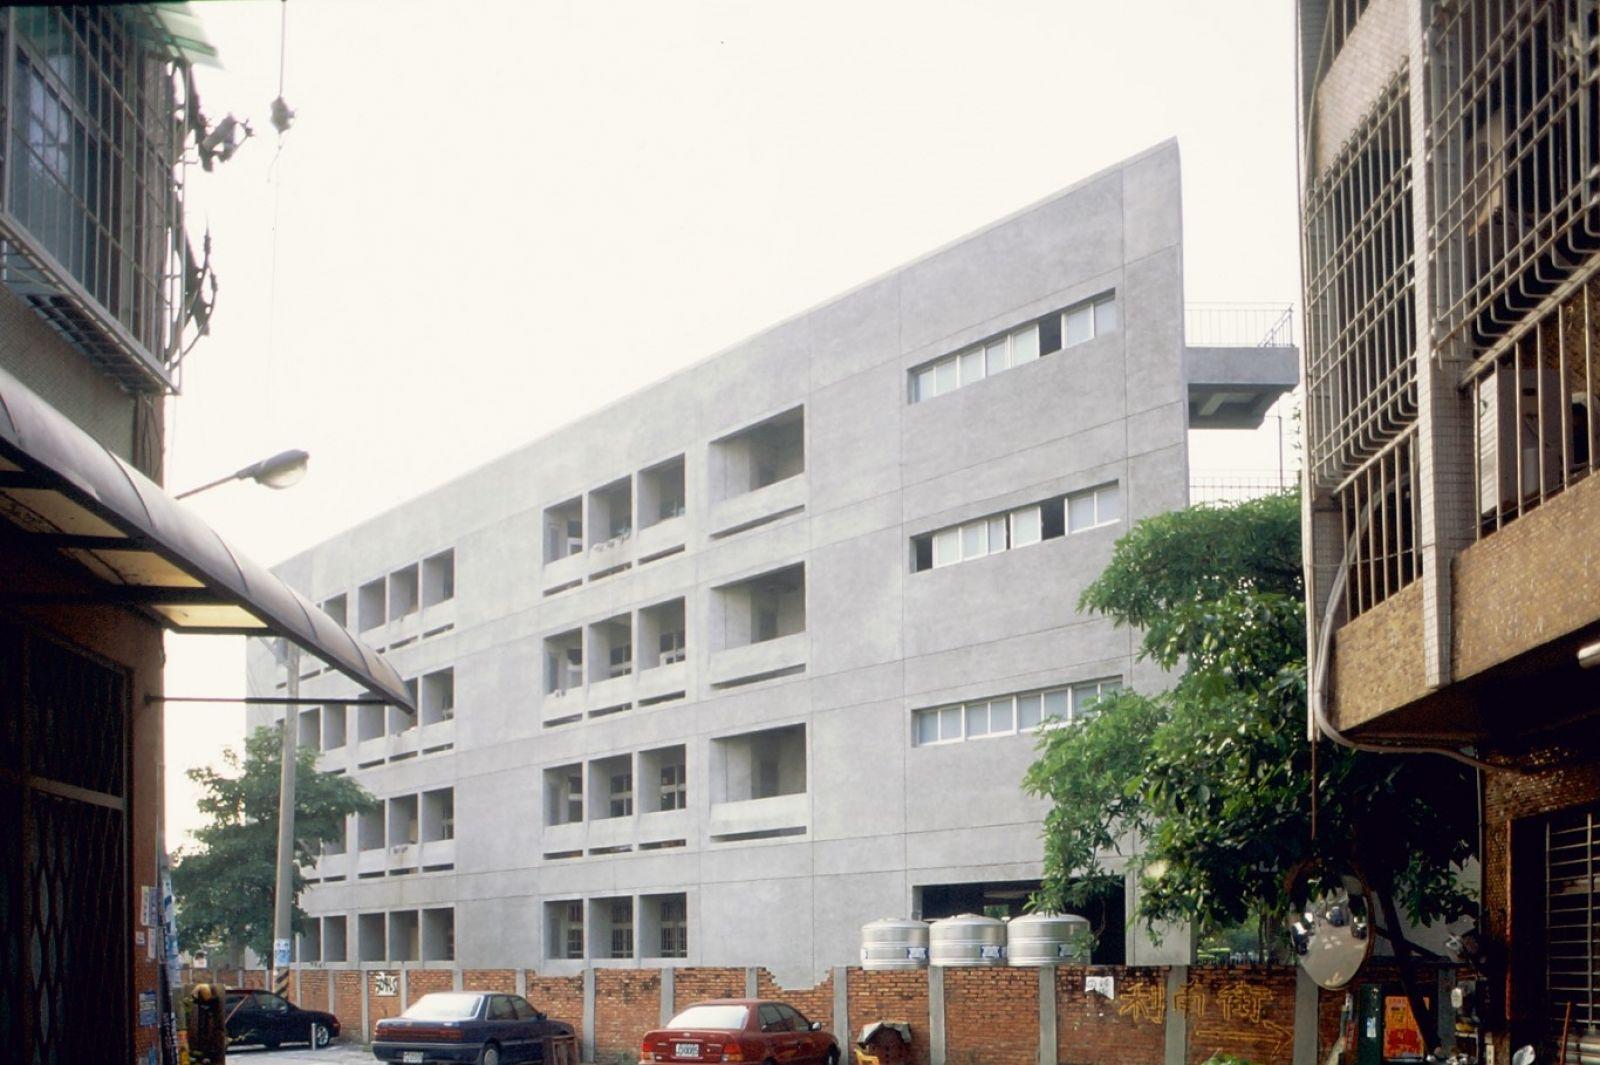 Rihsin primary school 921 earthquake building,tainan